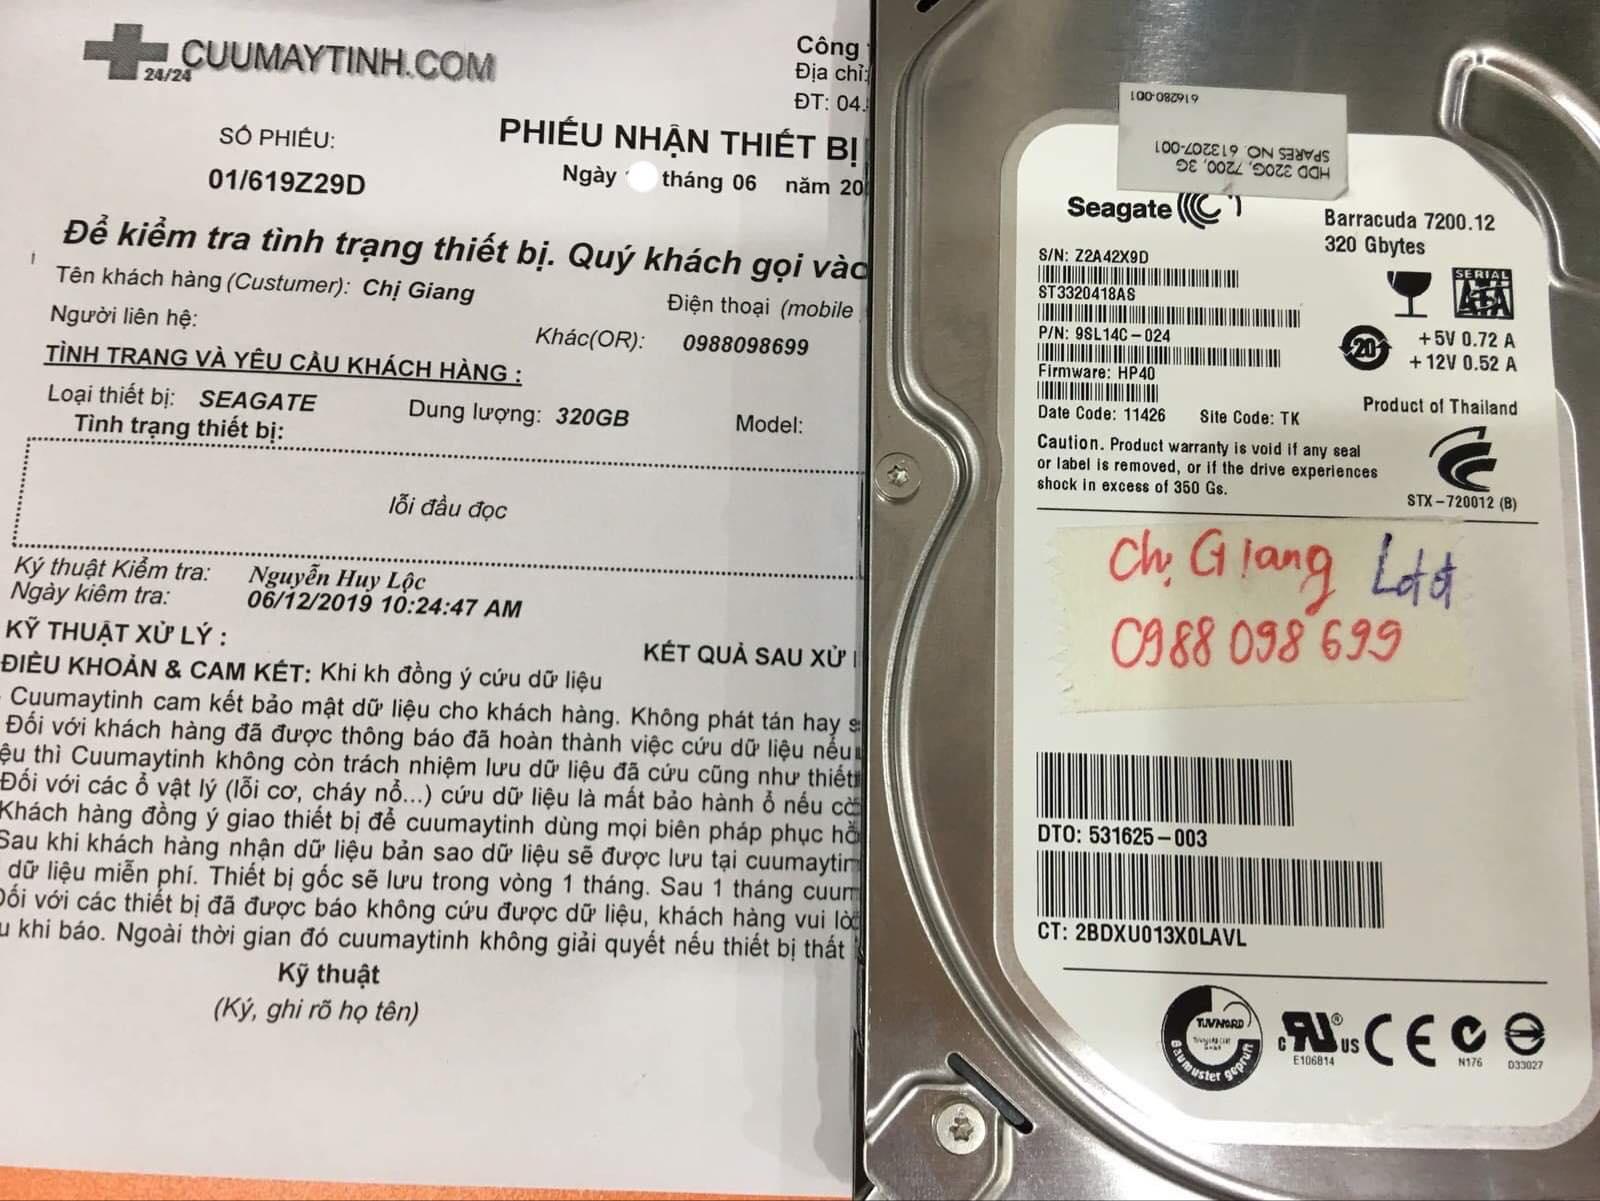 Cứu dữ liệu ổ cứng Seagate 320GB lỗi đầu đọc 20/06/2019 - cuumaytinh